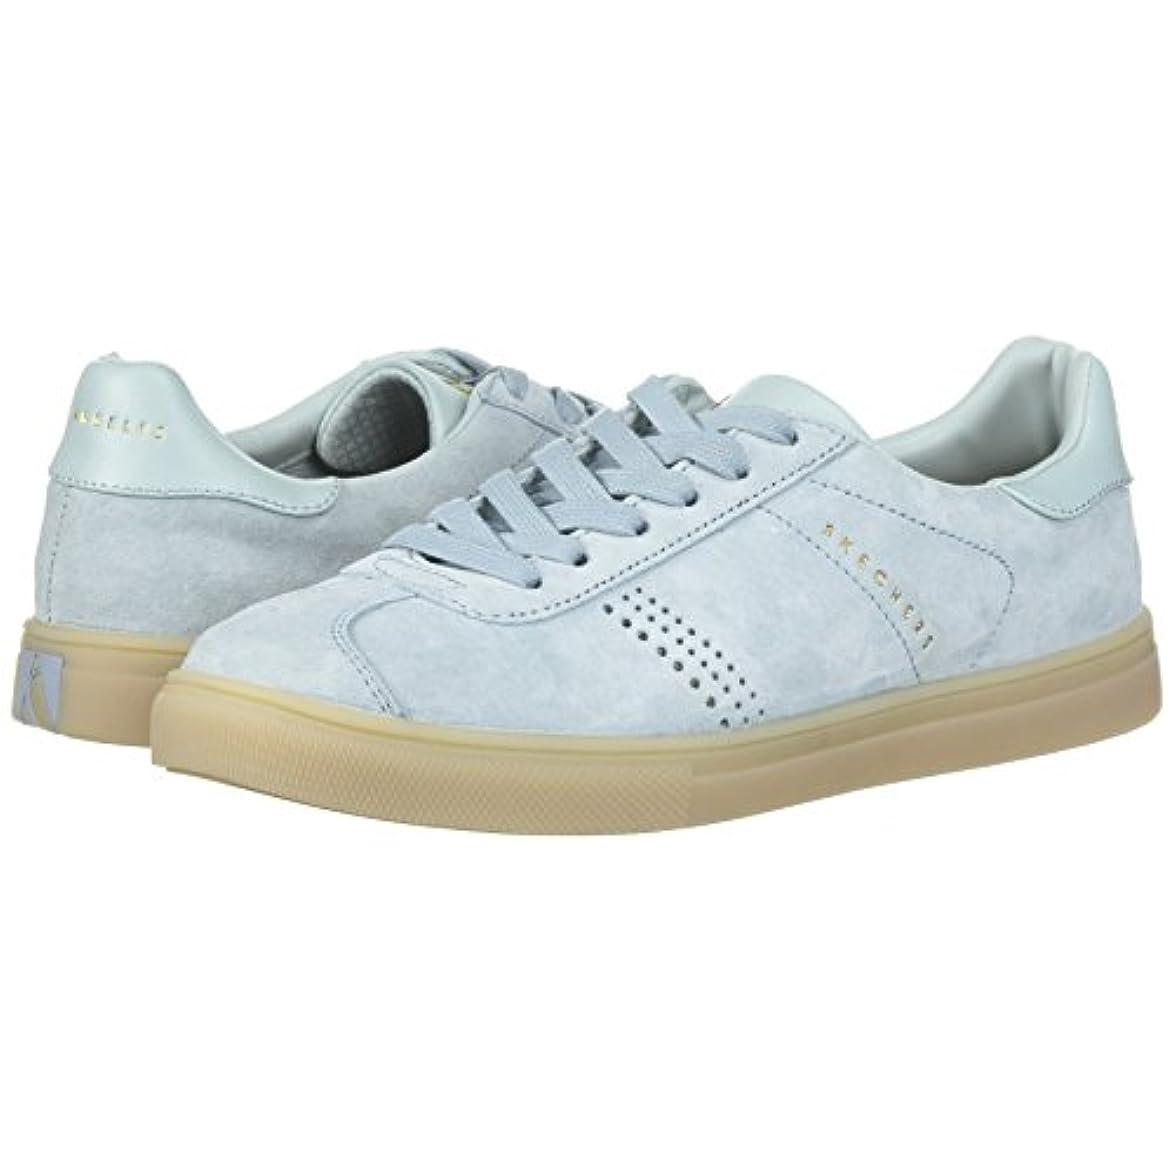 Skechers Ltbl Donna Sneaker Ltbl 73514 Blau Blu